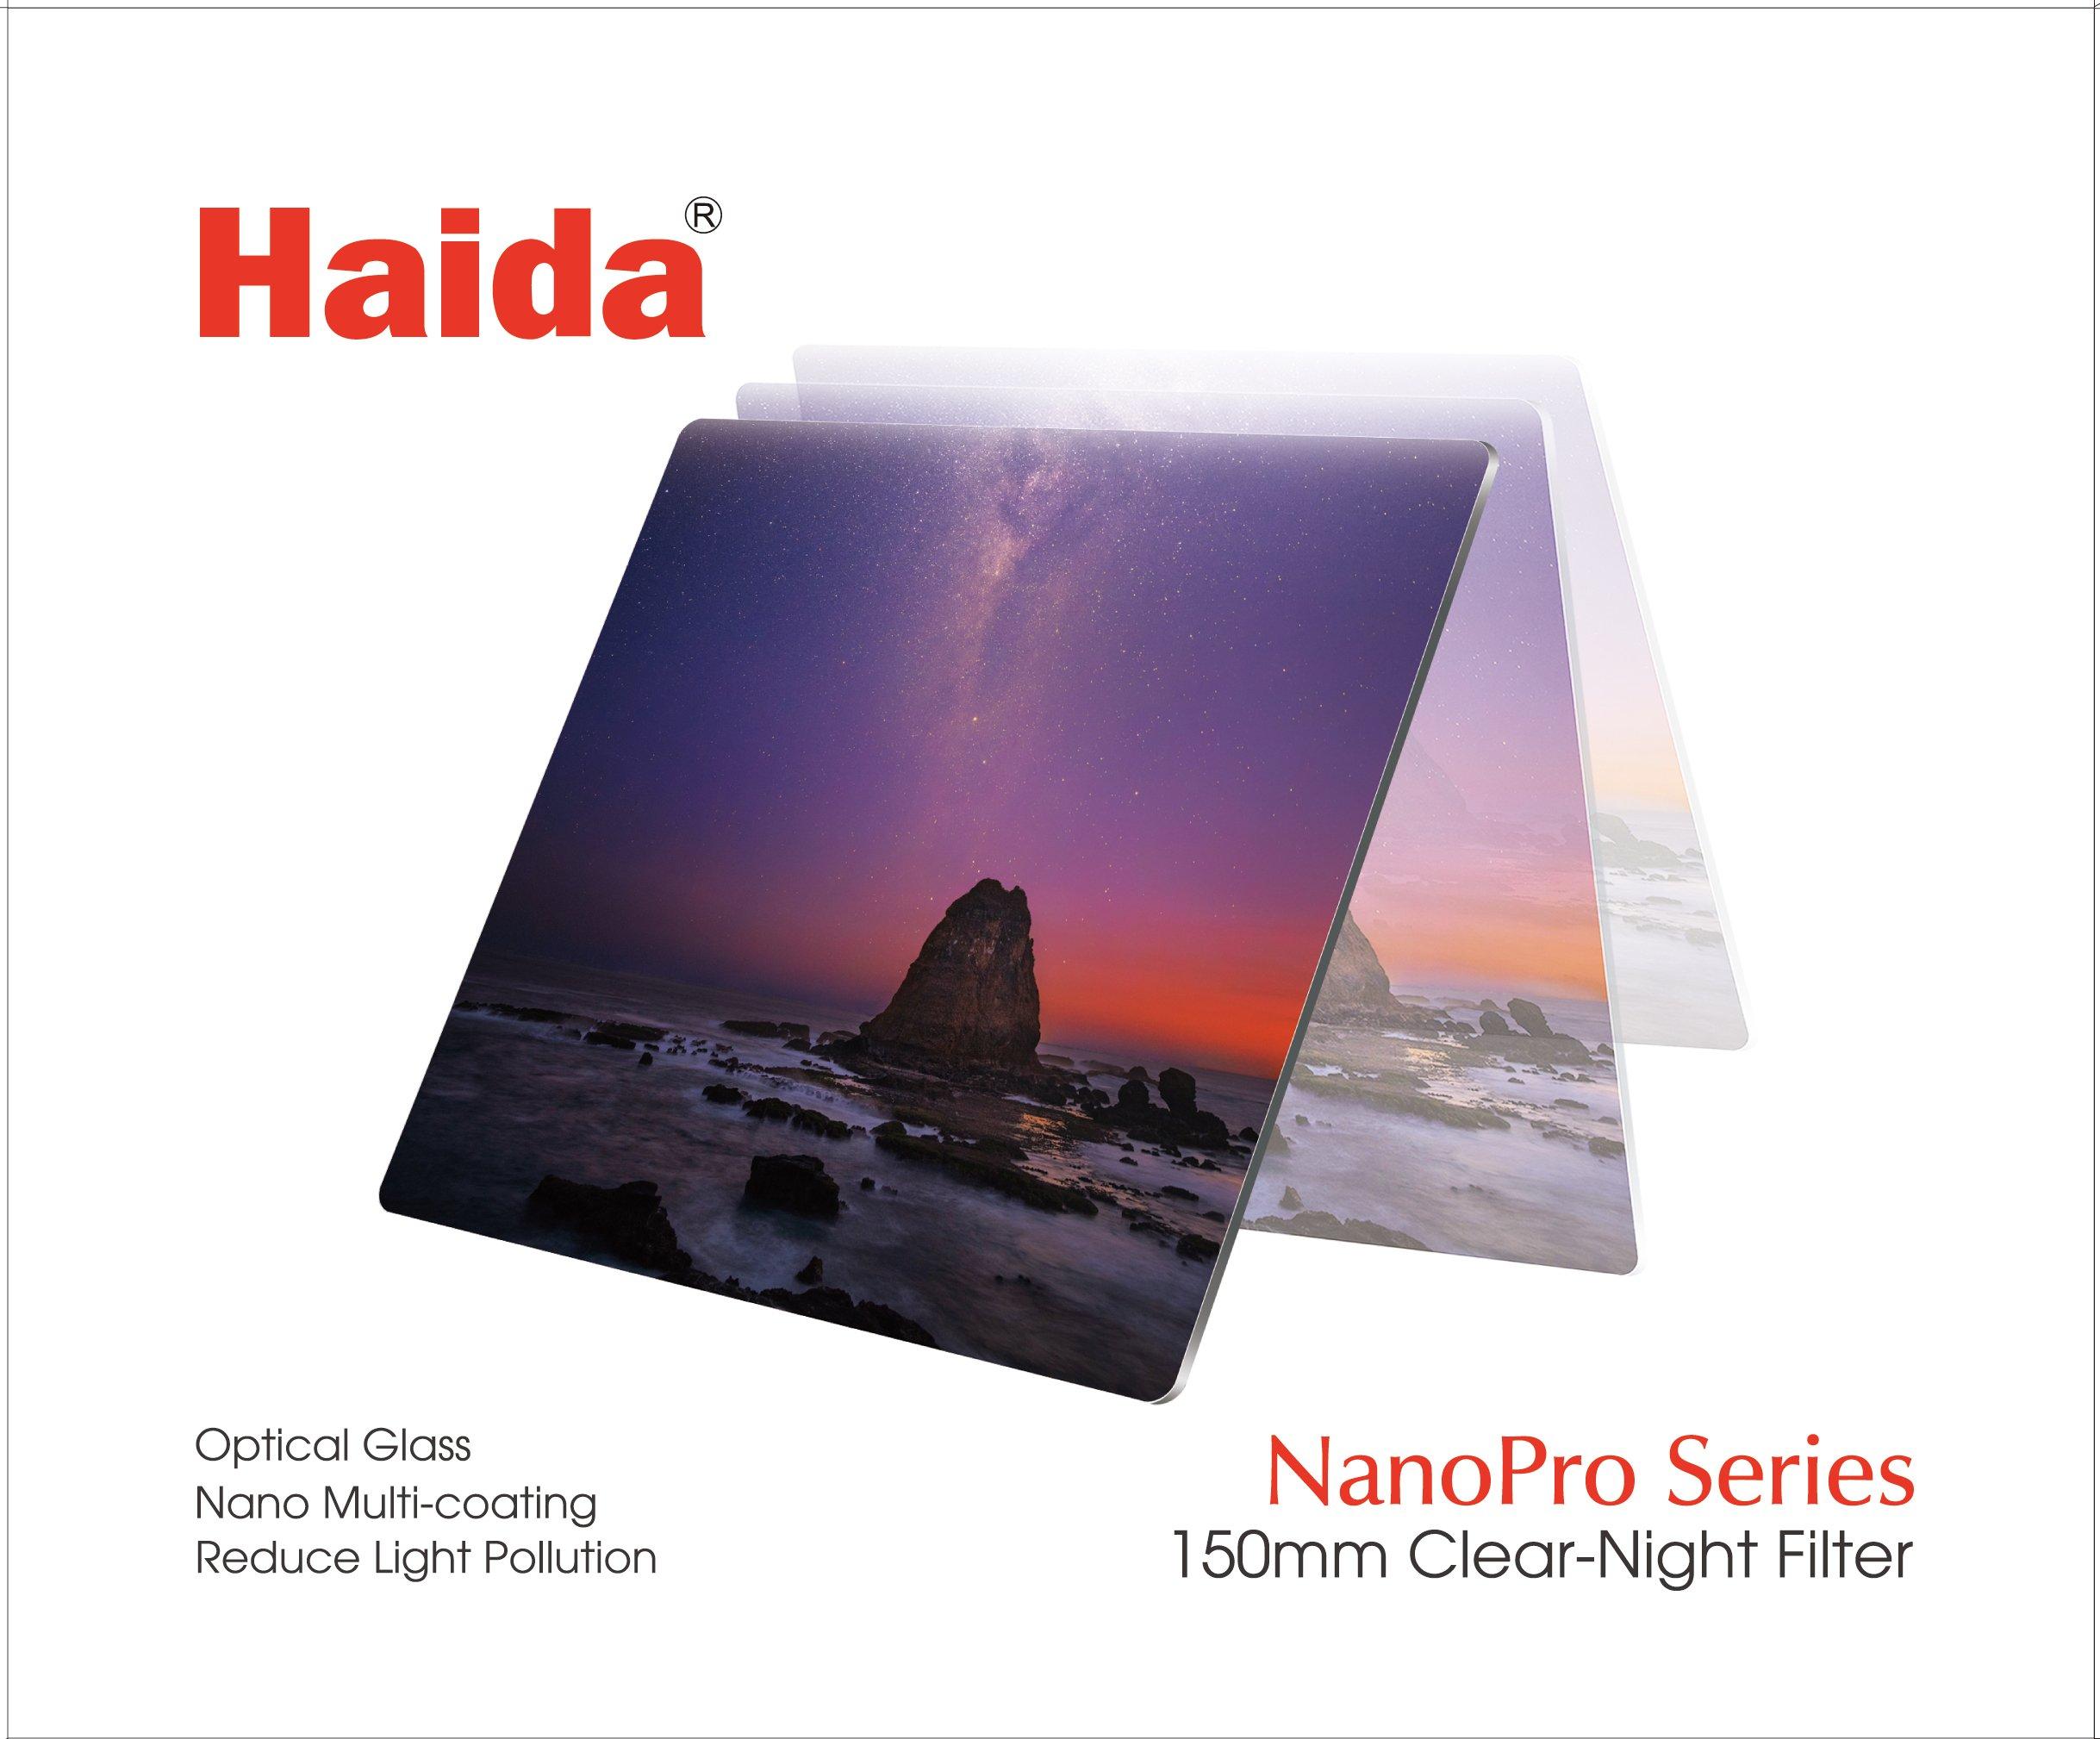 Haida 150mm Clear-Night Filter NanoPro MC Light Pollution Reduction for Sky / Star 150 x 150 HD3703